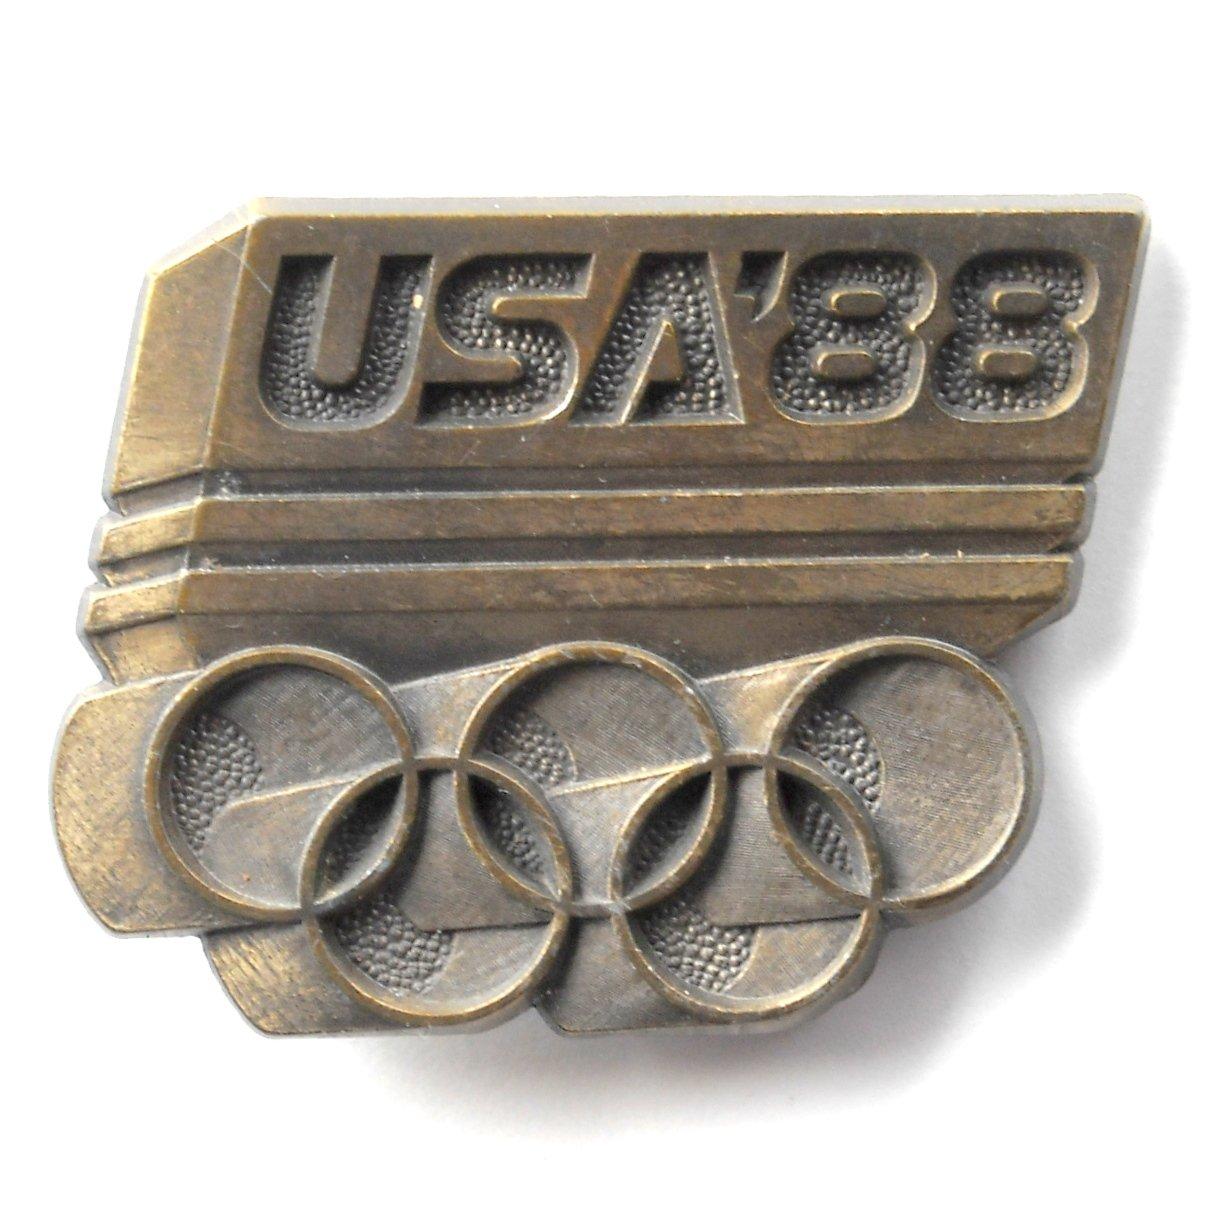 XXX USA 88 Olympics 1988 mens Brass color belt buckle